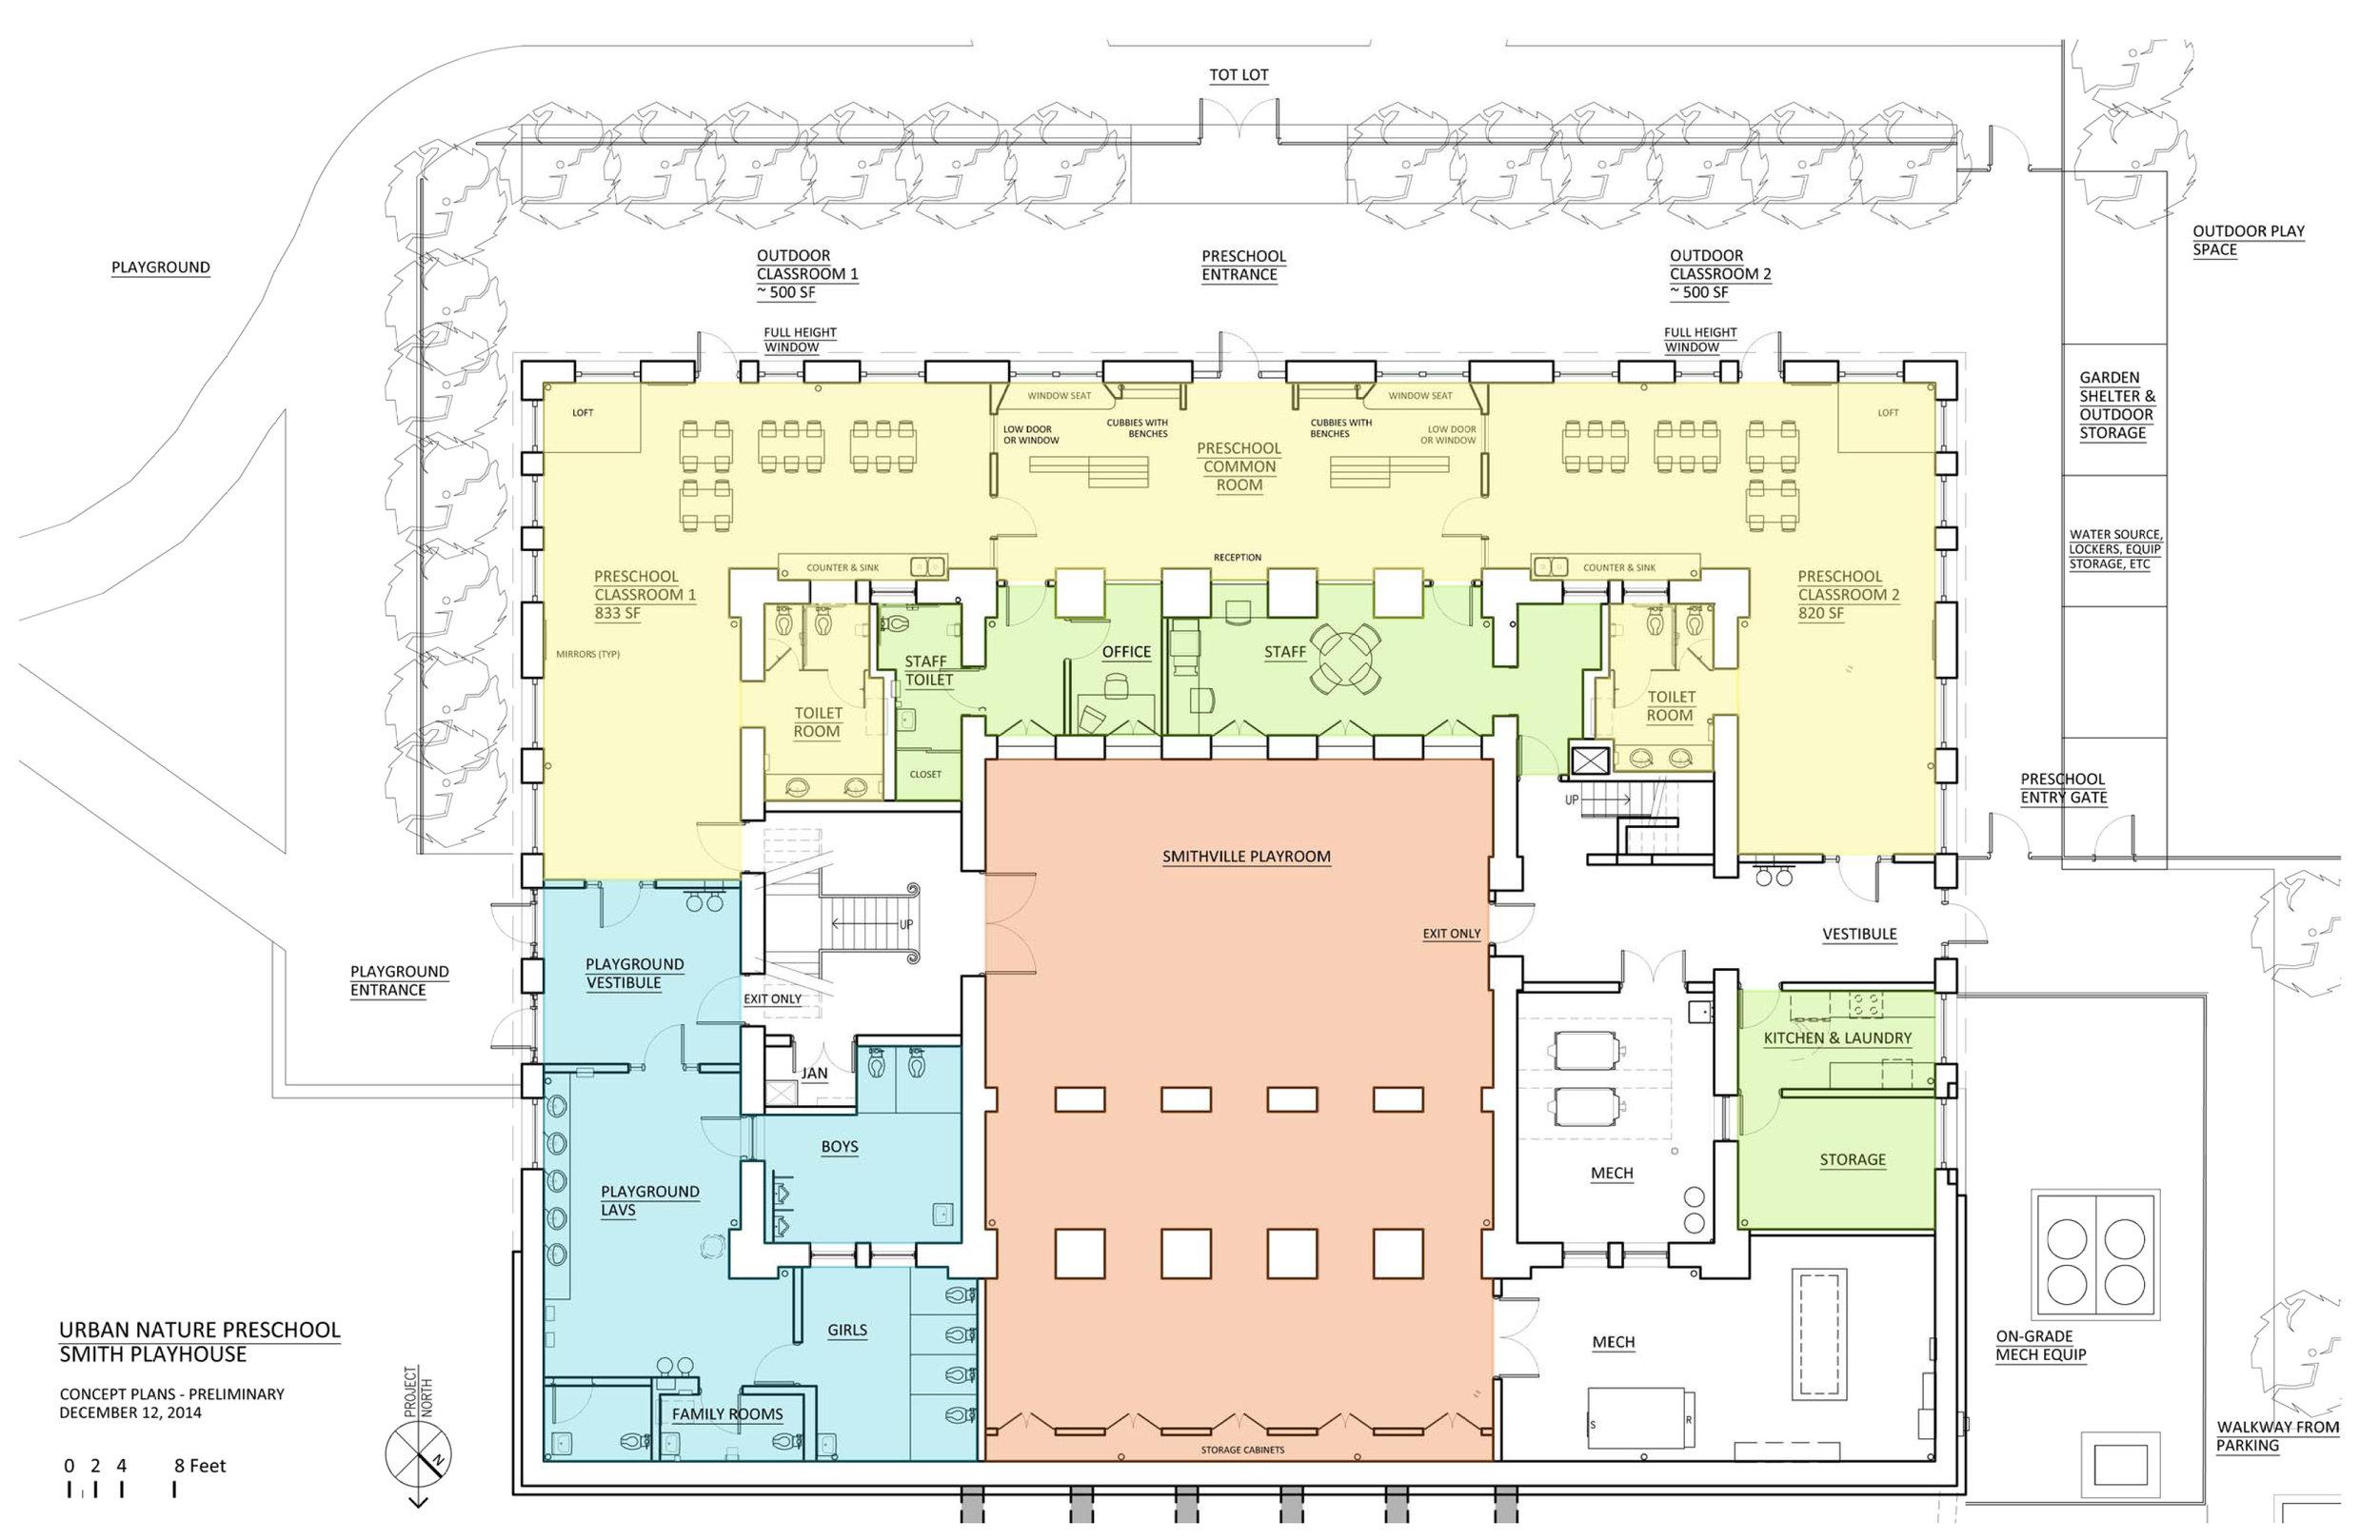 2014-12-12 Concept Plan.jpg